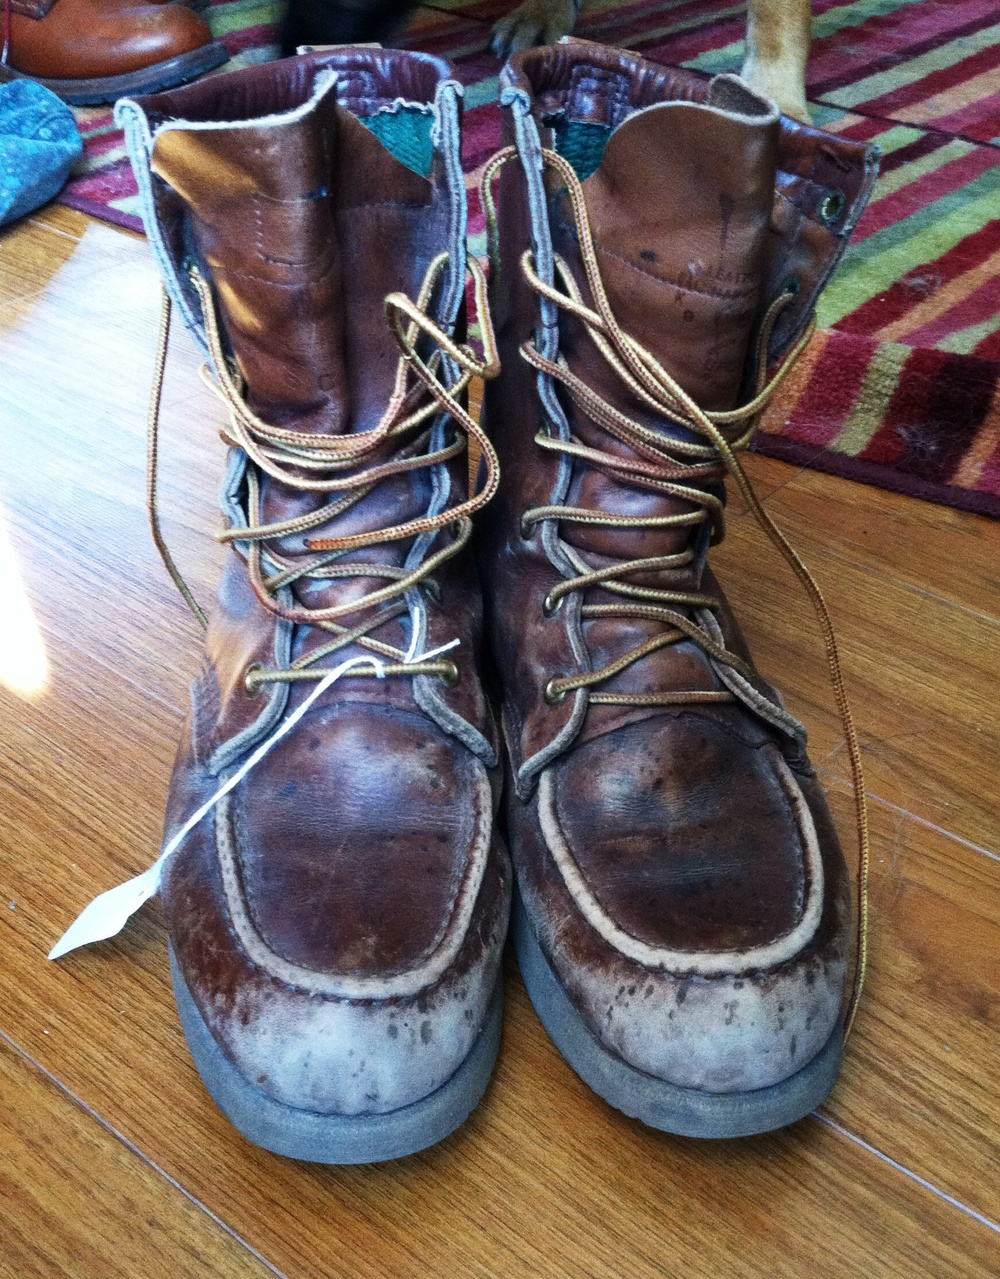 smarts on shoe care refurbishing leather boots